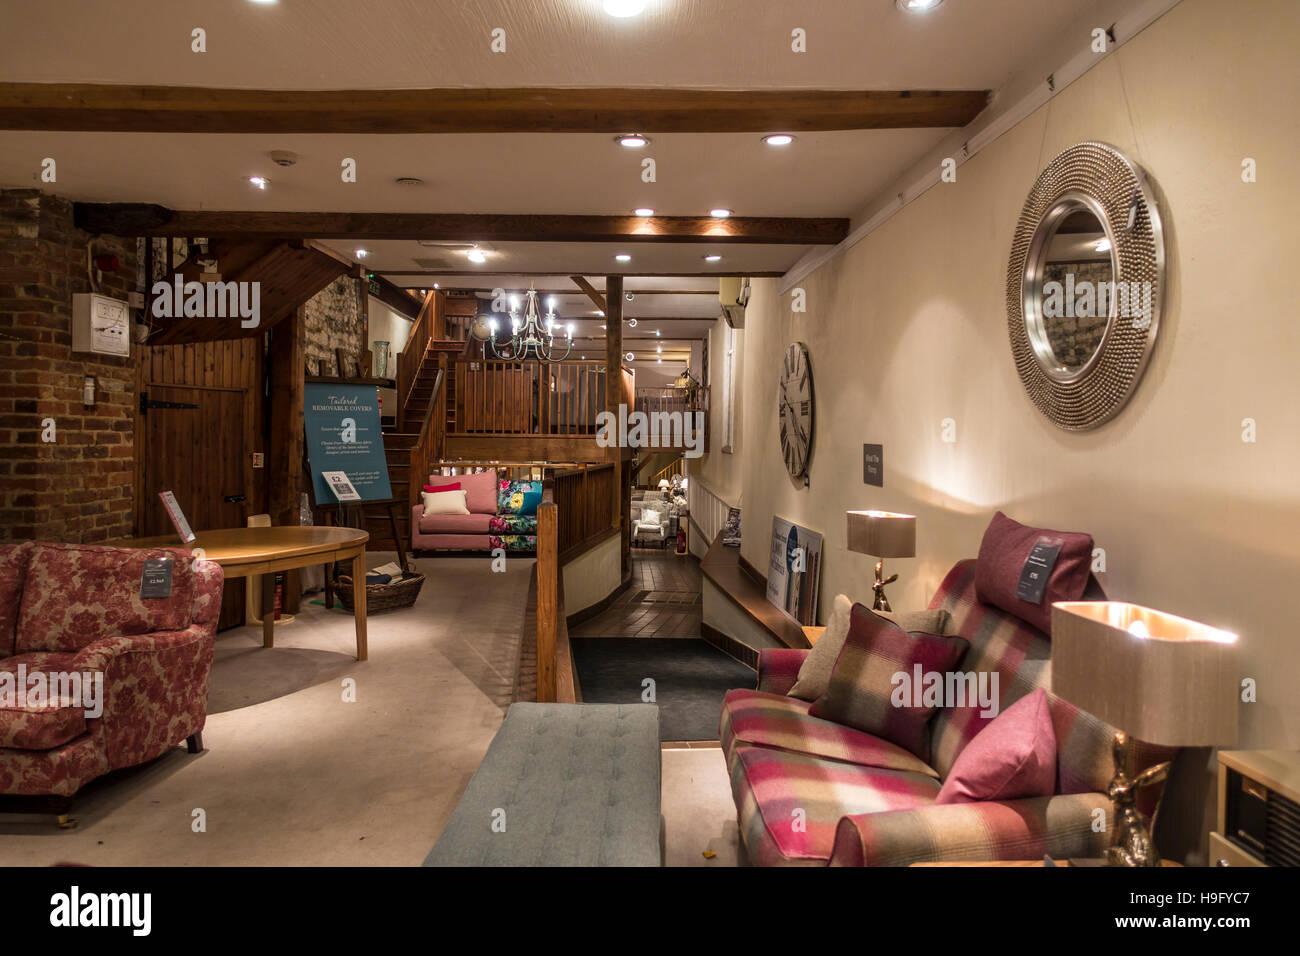 Multiyork Prestige Furniture Shop Best Lane Canterbury Kent - Stock Image